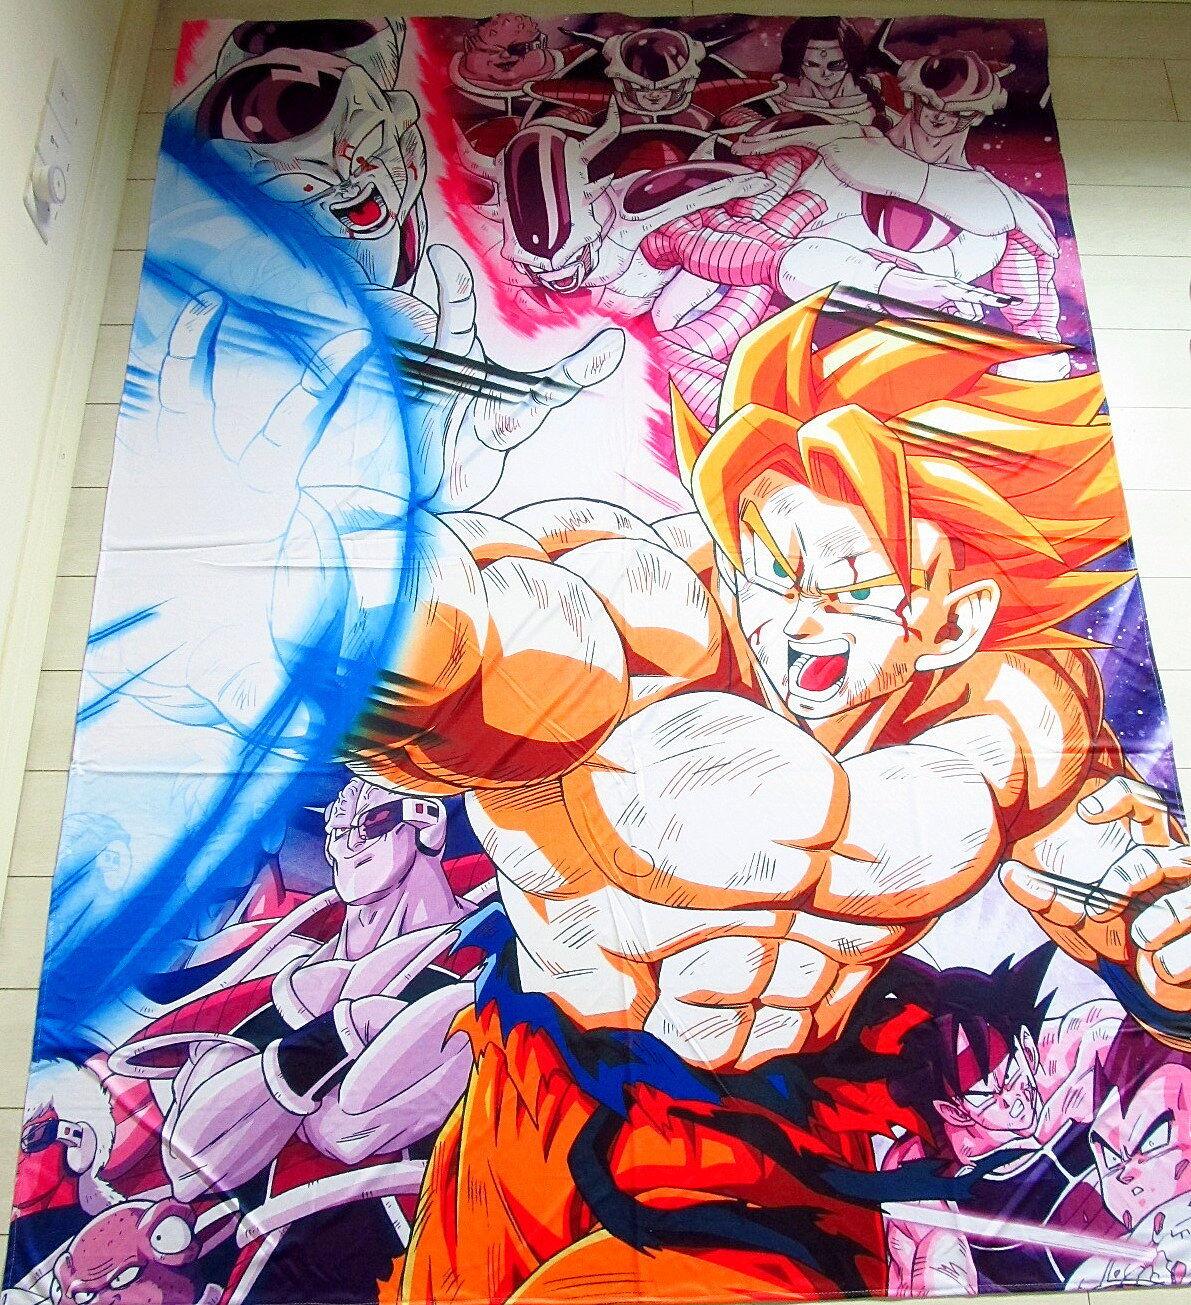 Dragonball Z anime manga Gardine cortina H; 200 B; 150cm nuevo